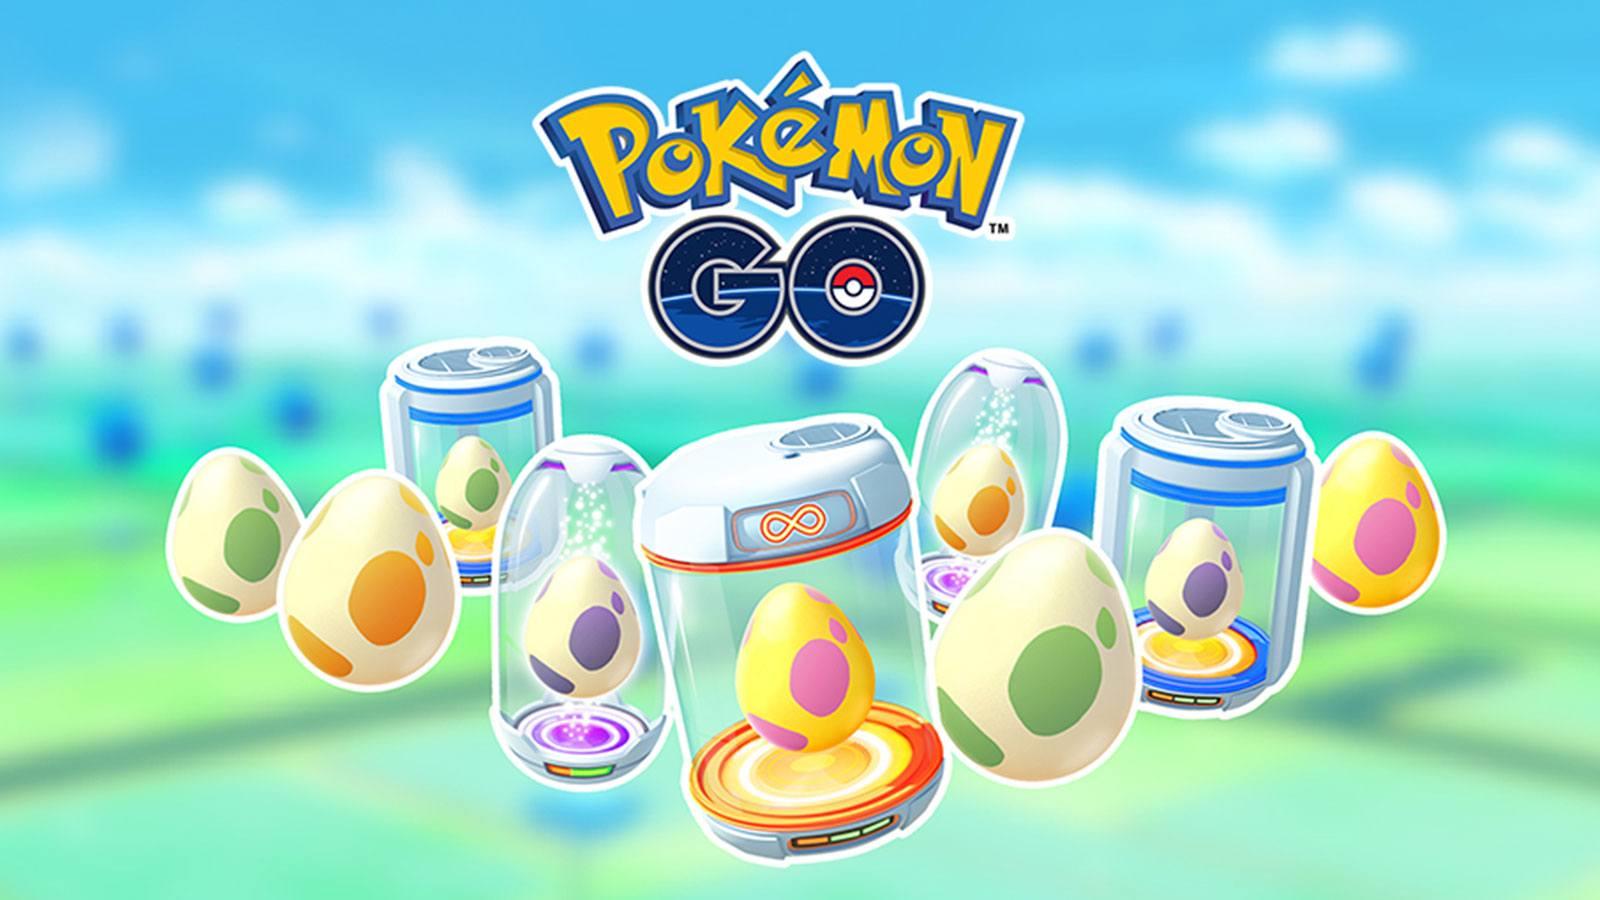 Œufs dans Pokémon GO